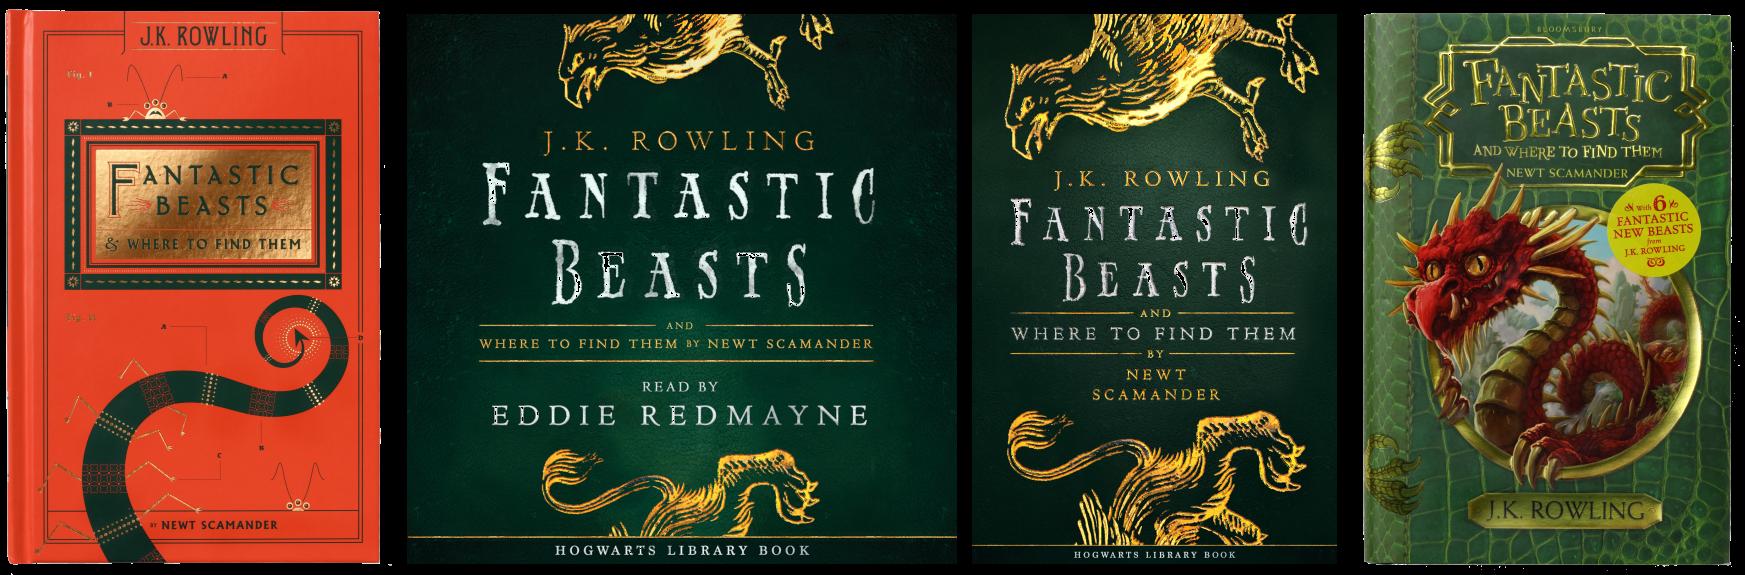 L R Us Hardback Scholastic Cover By Headcase Design Digital Audiobook Pottermo Fantastic Beasts Jk Rowling Fantastic Beasts Harry Potter Fantastic Beasts